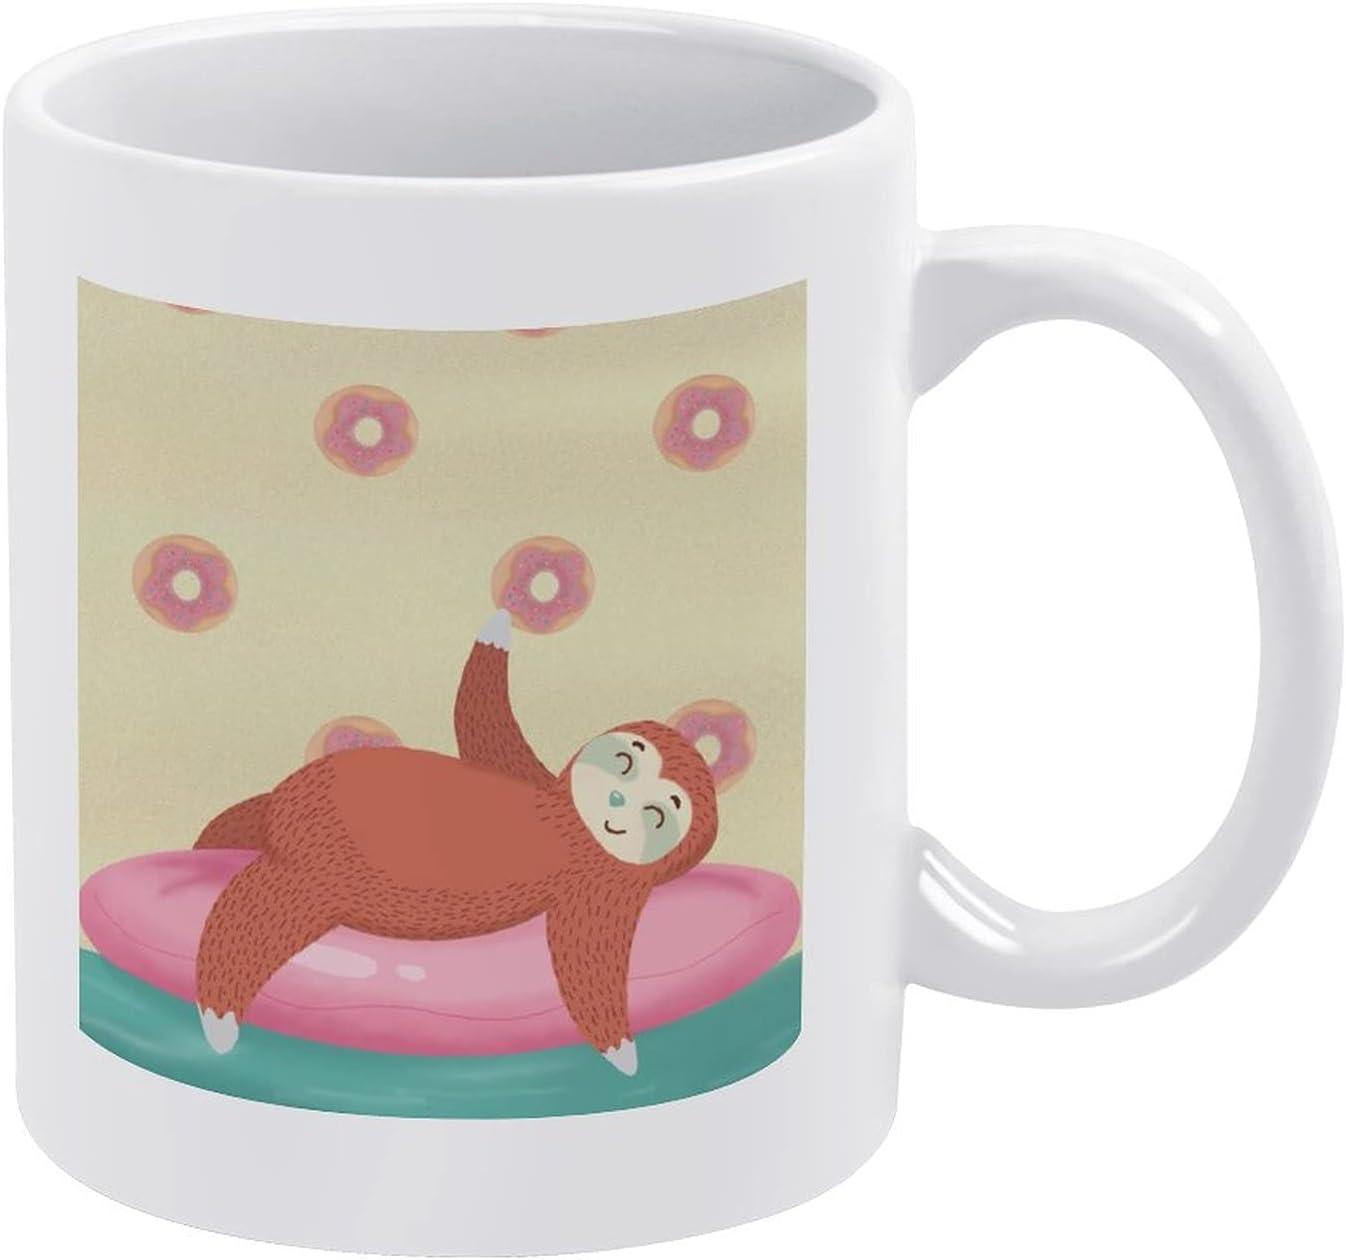 Lazy Credence San Diego Mall Sloth Theme White Mug,Ceramic Cup Coffee Tea Mugs